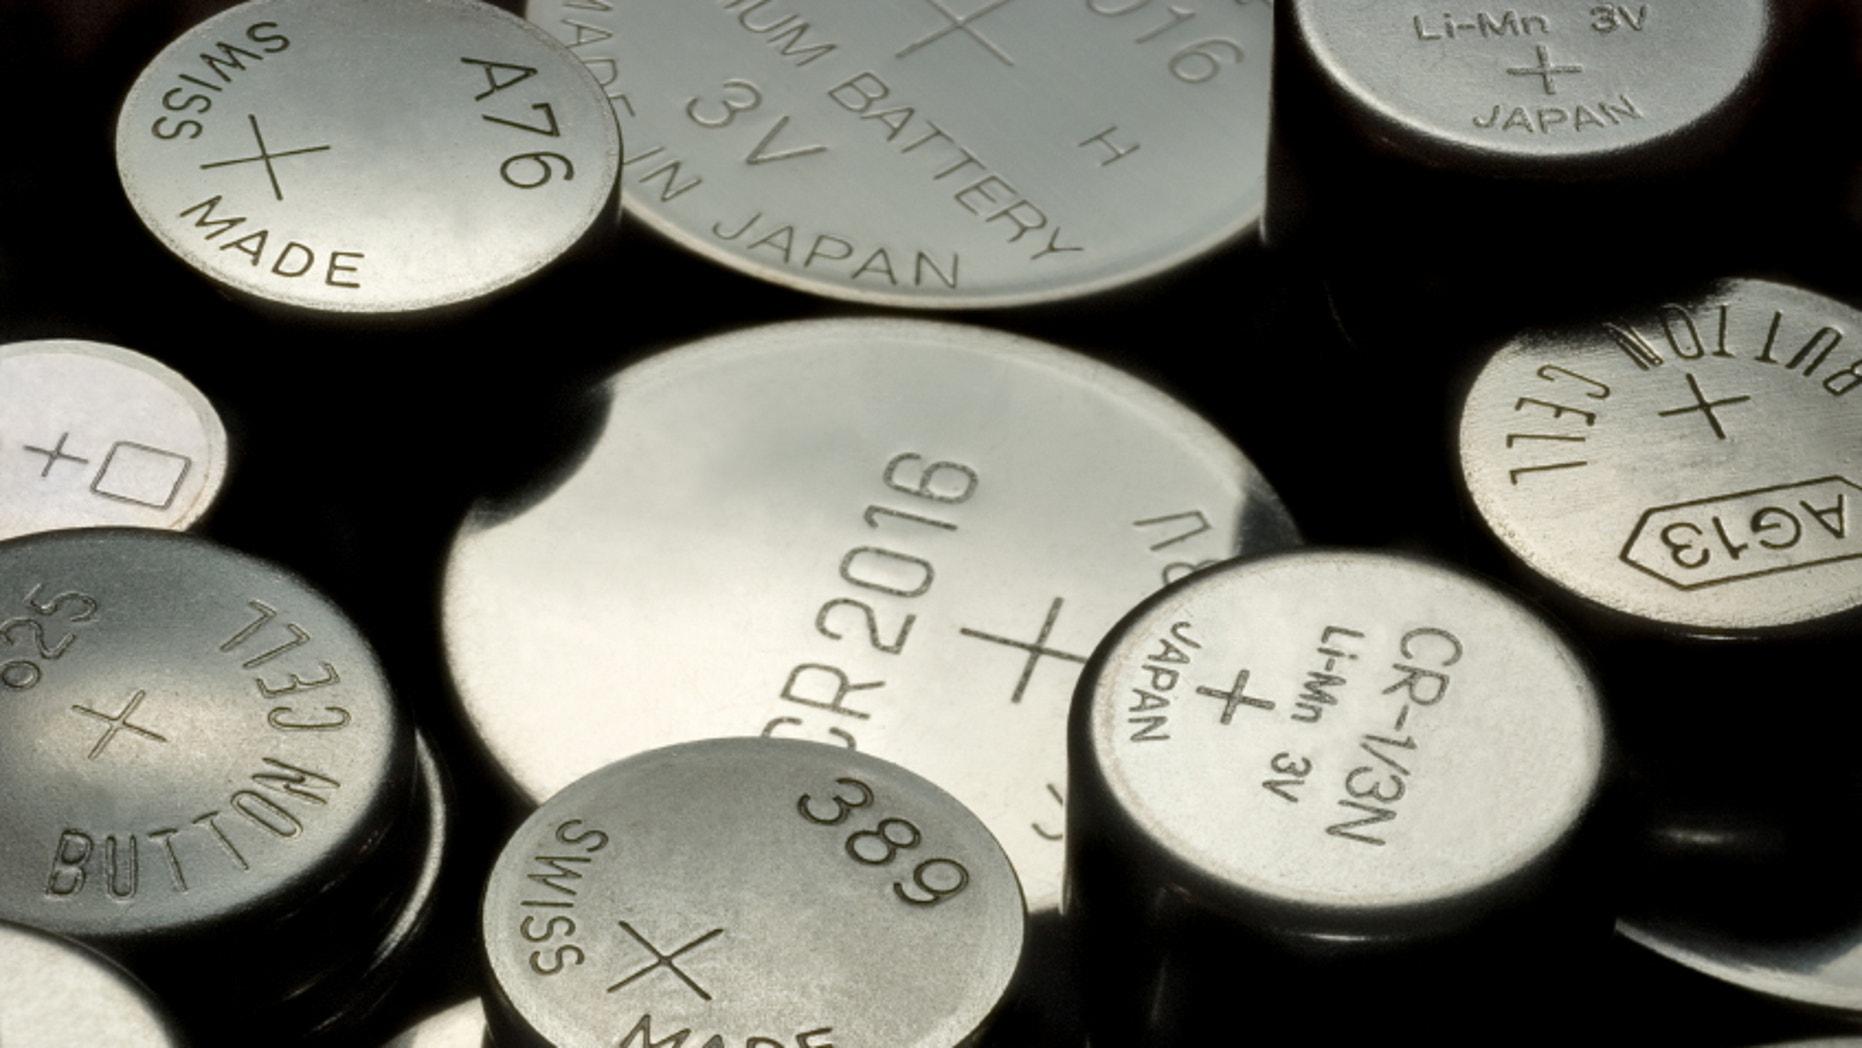 macro shot of various button cells